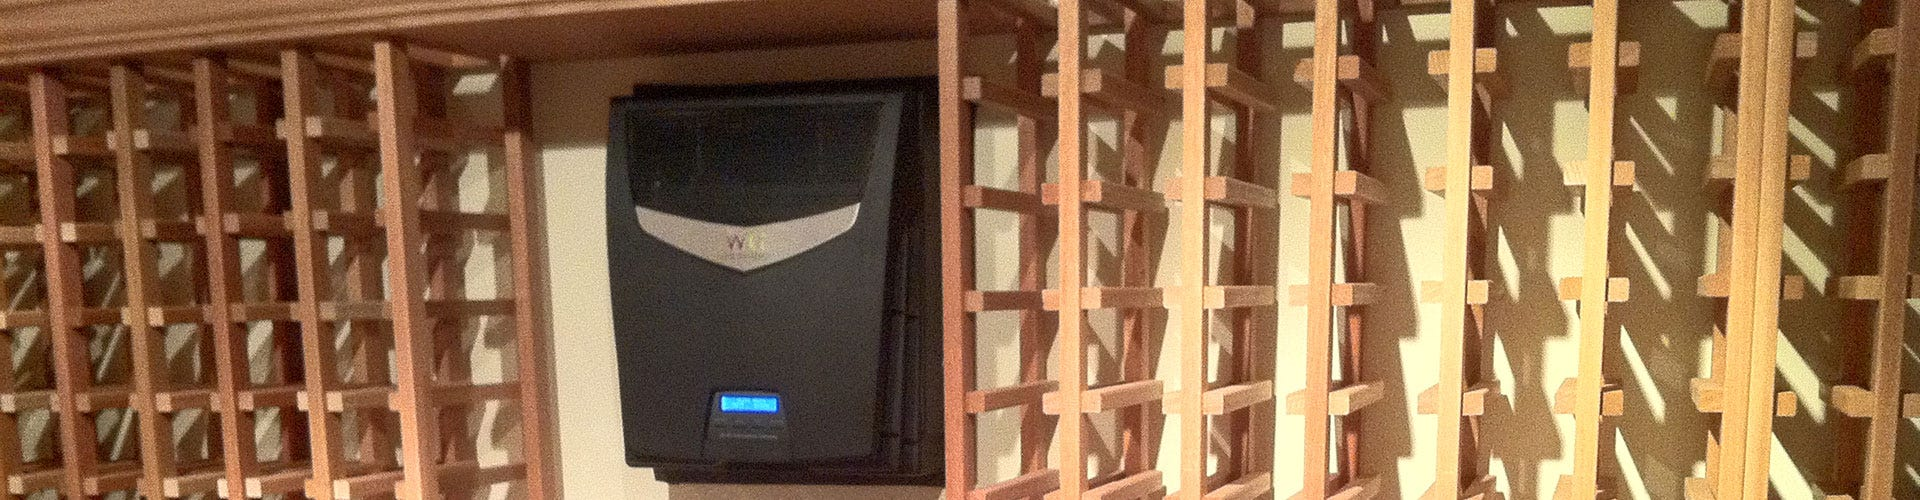 Wine Cellar Cooling Units